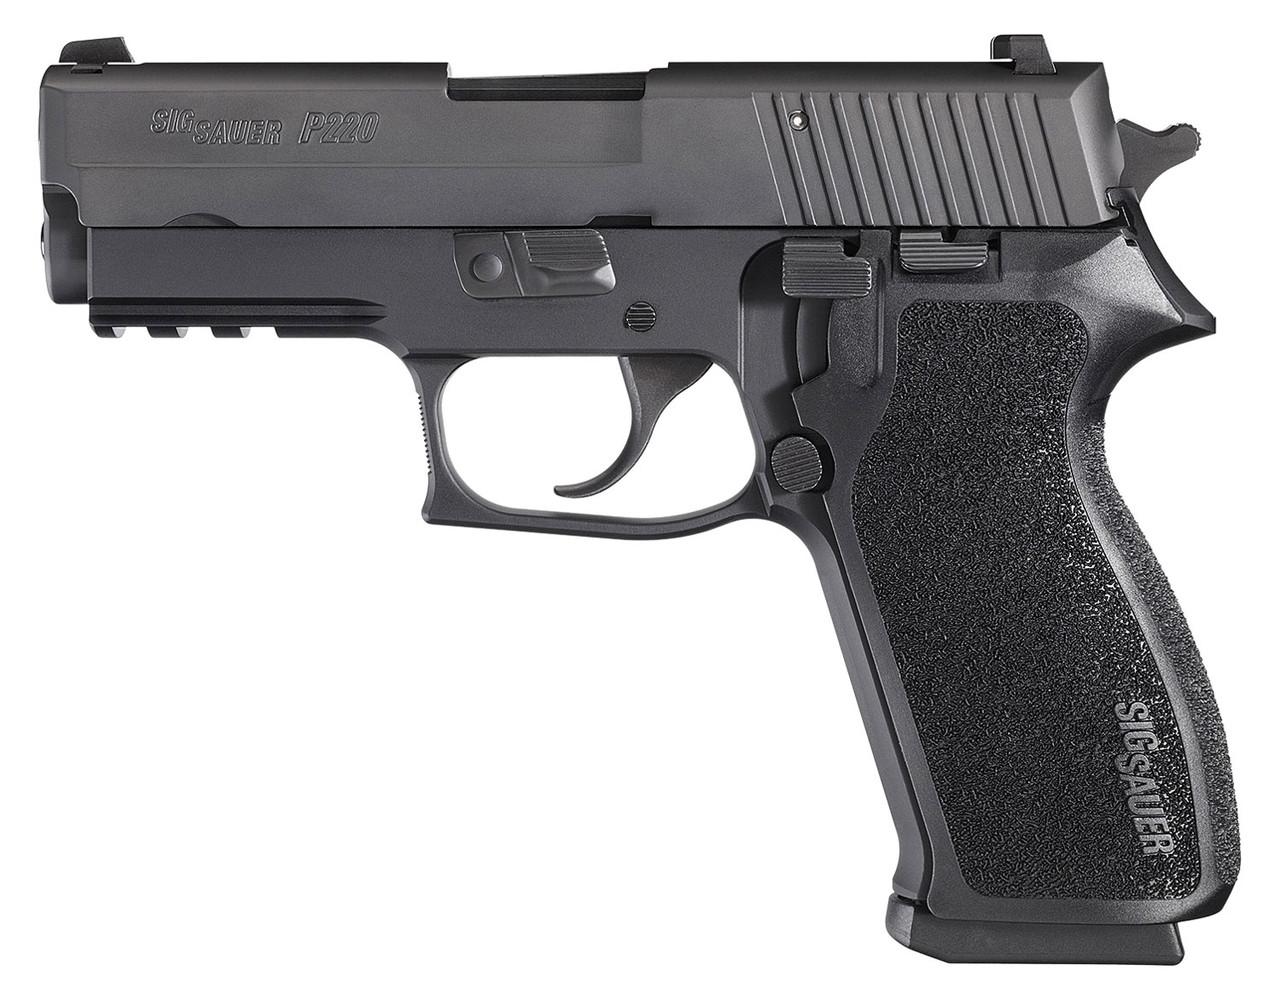 Sig Sauer P220 Carry CALIFORNIA LEGAL - .45ACP